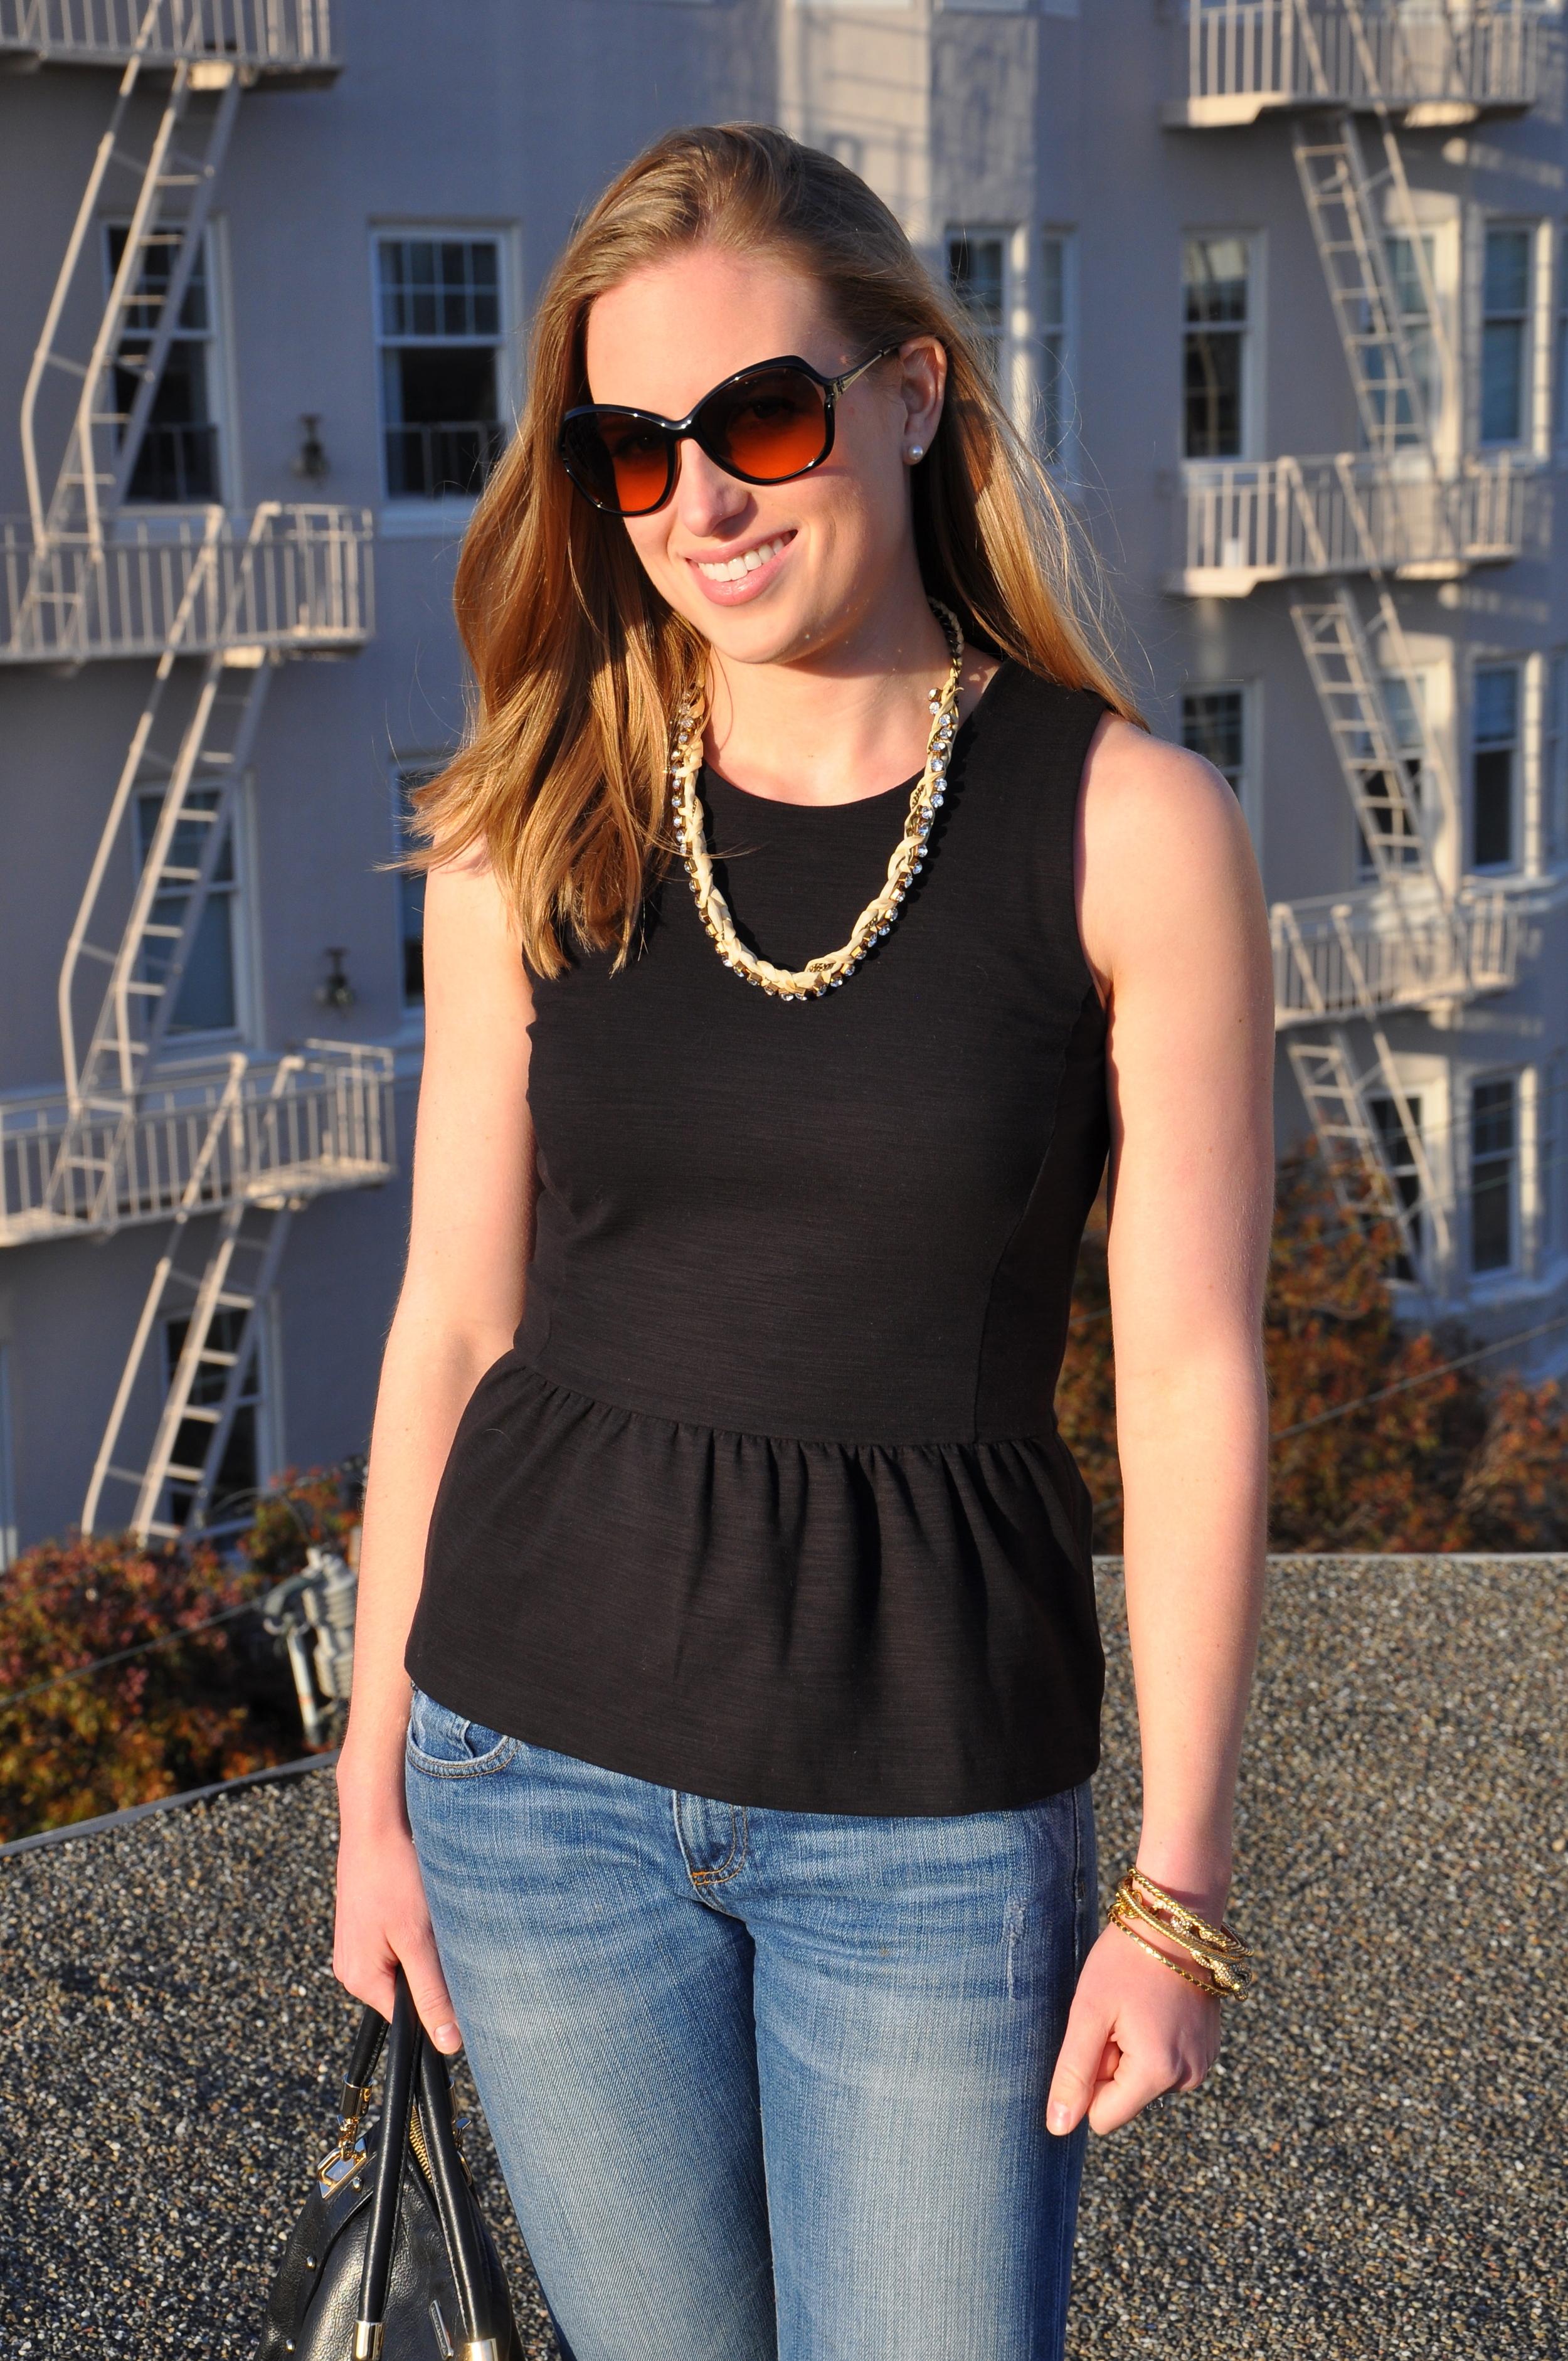 Madewell shirt, AG jeans, J. Crew necklace (old), J. Crew heels (similar), J. Crew bracelet, J. Crew bangles, Rebecca Minkoff bag, Tory Burch sunglasses (similar)